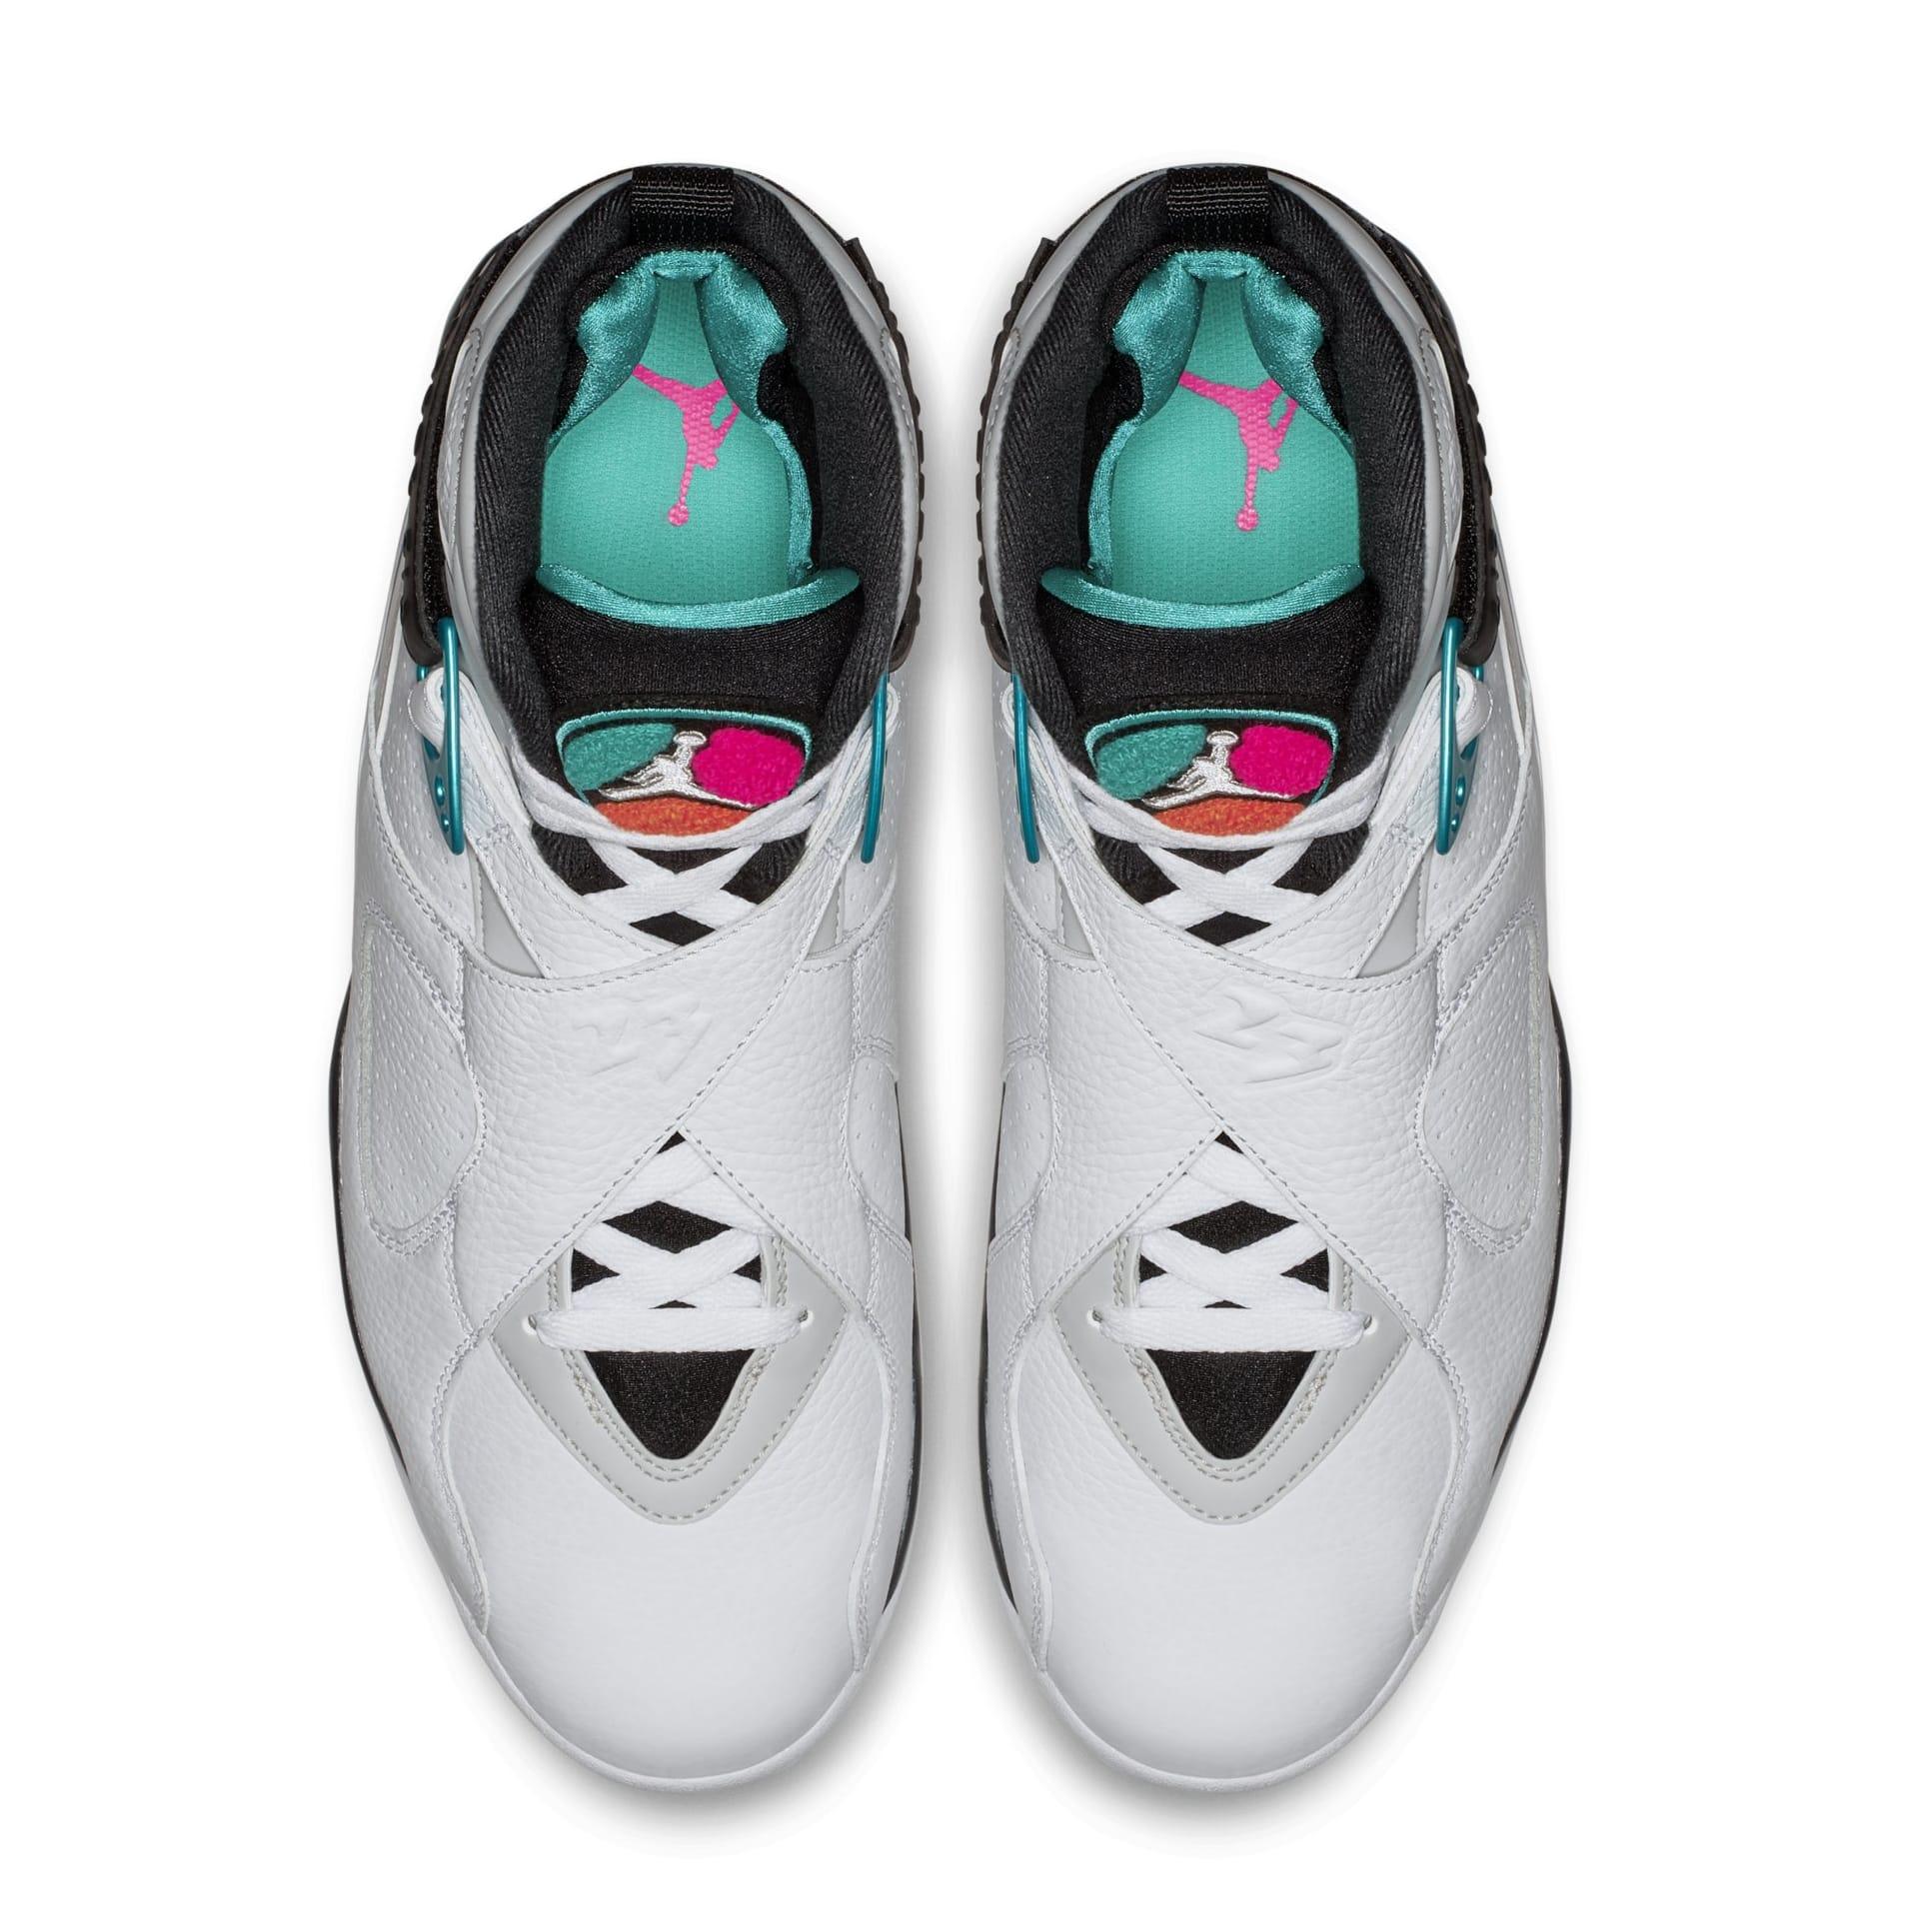 Air Jordan 8 VIII South Beach Release Date 305381-113  224bd5d97f